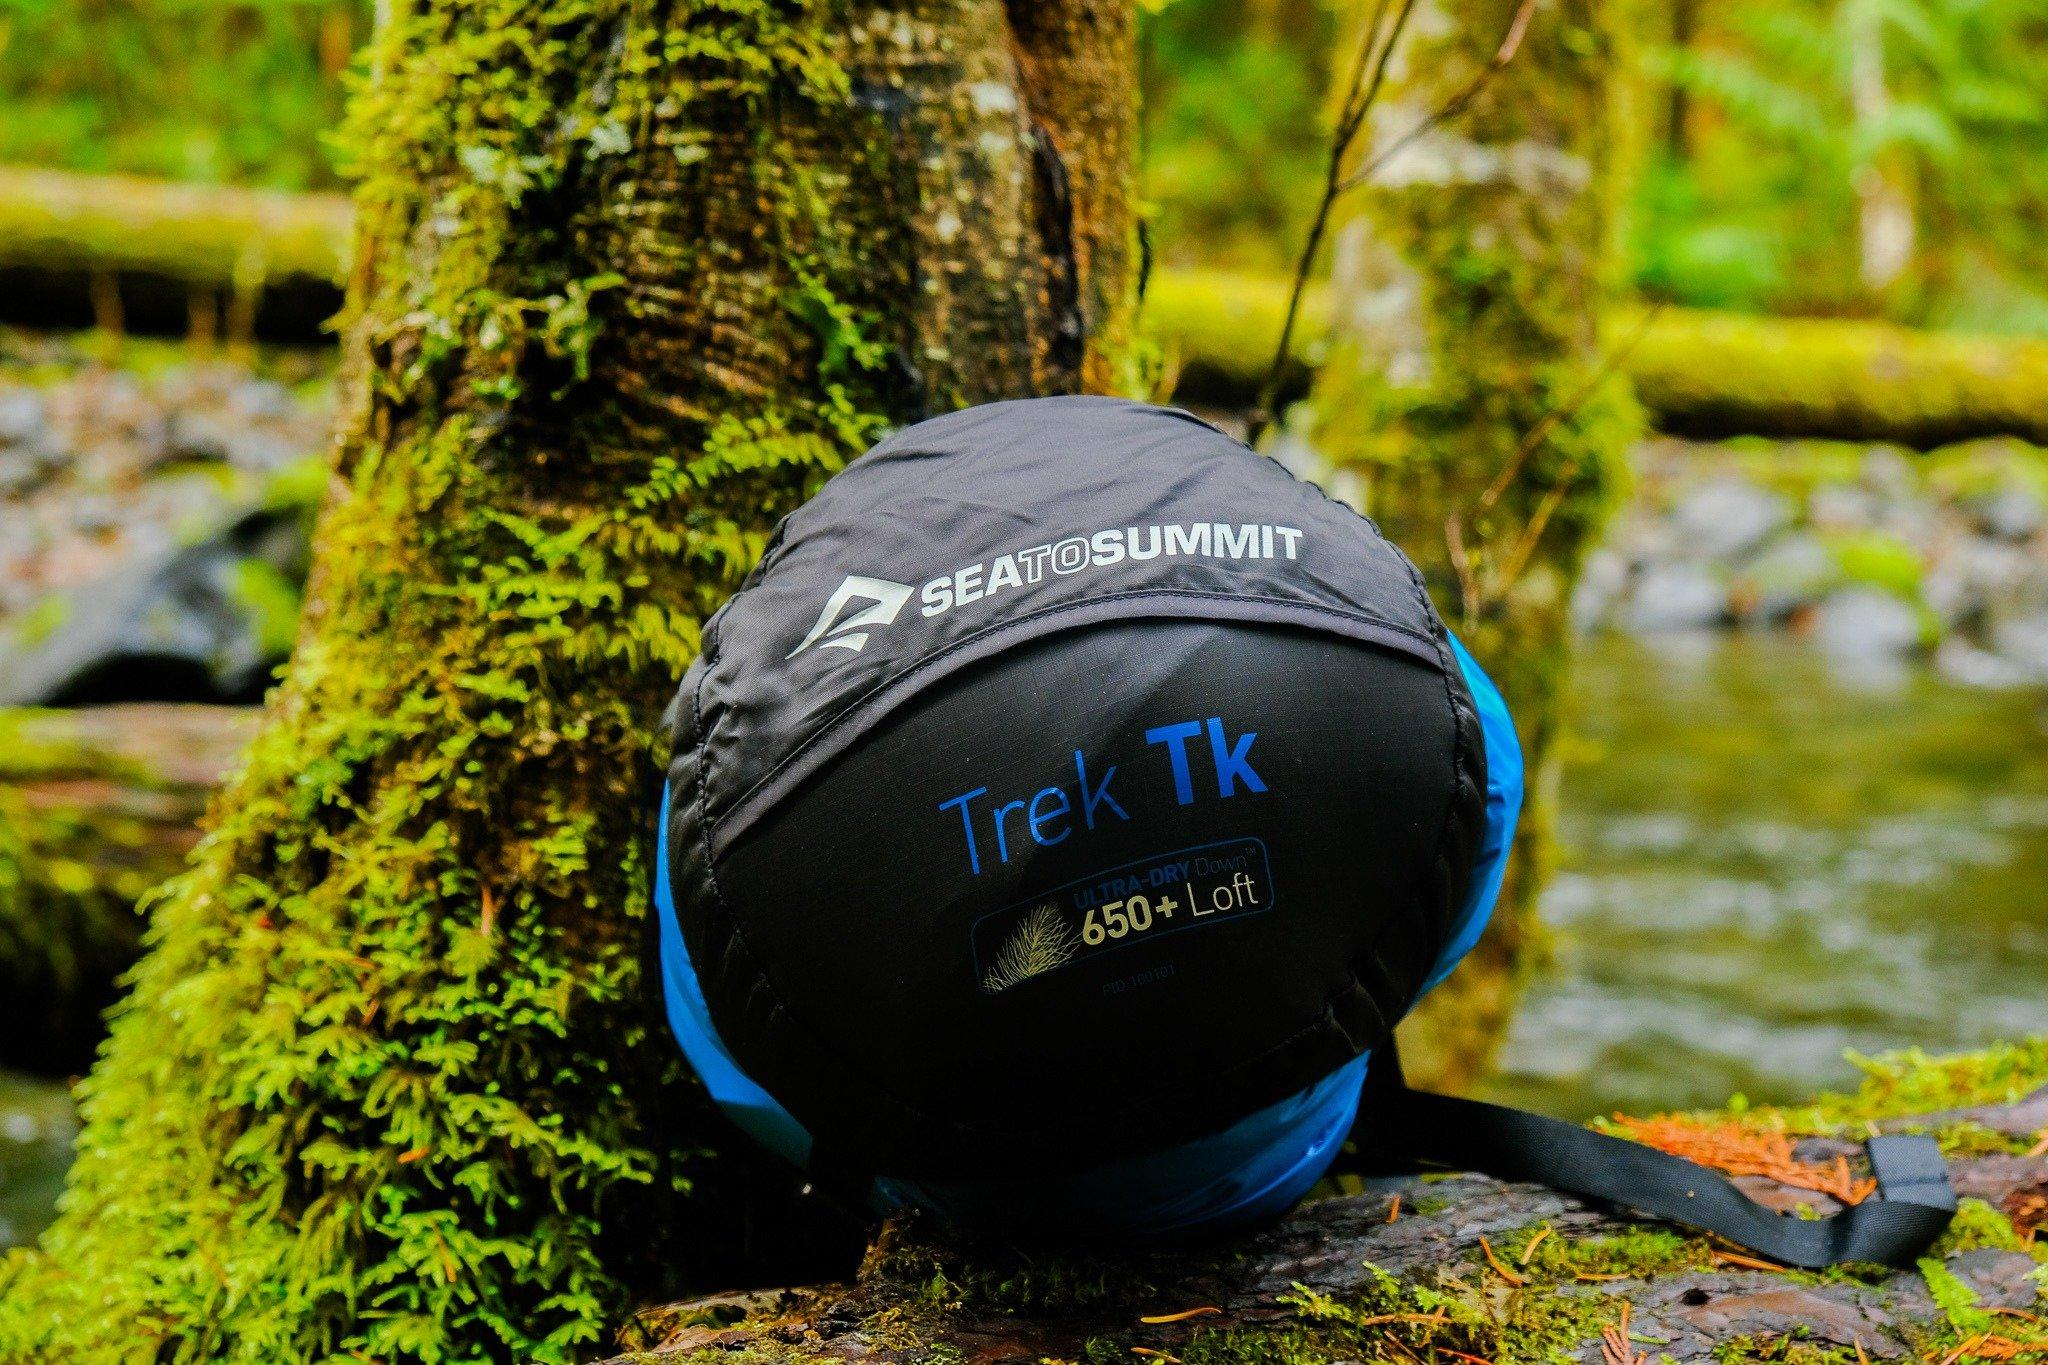 Sea to Summit sleeping bag review